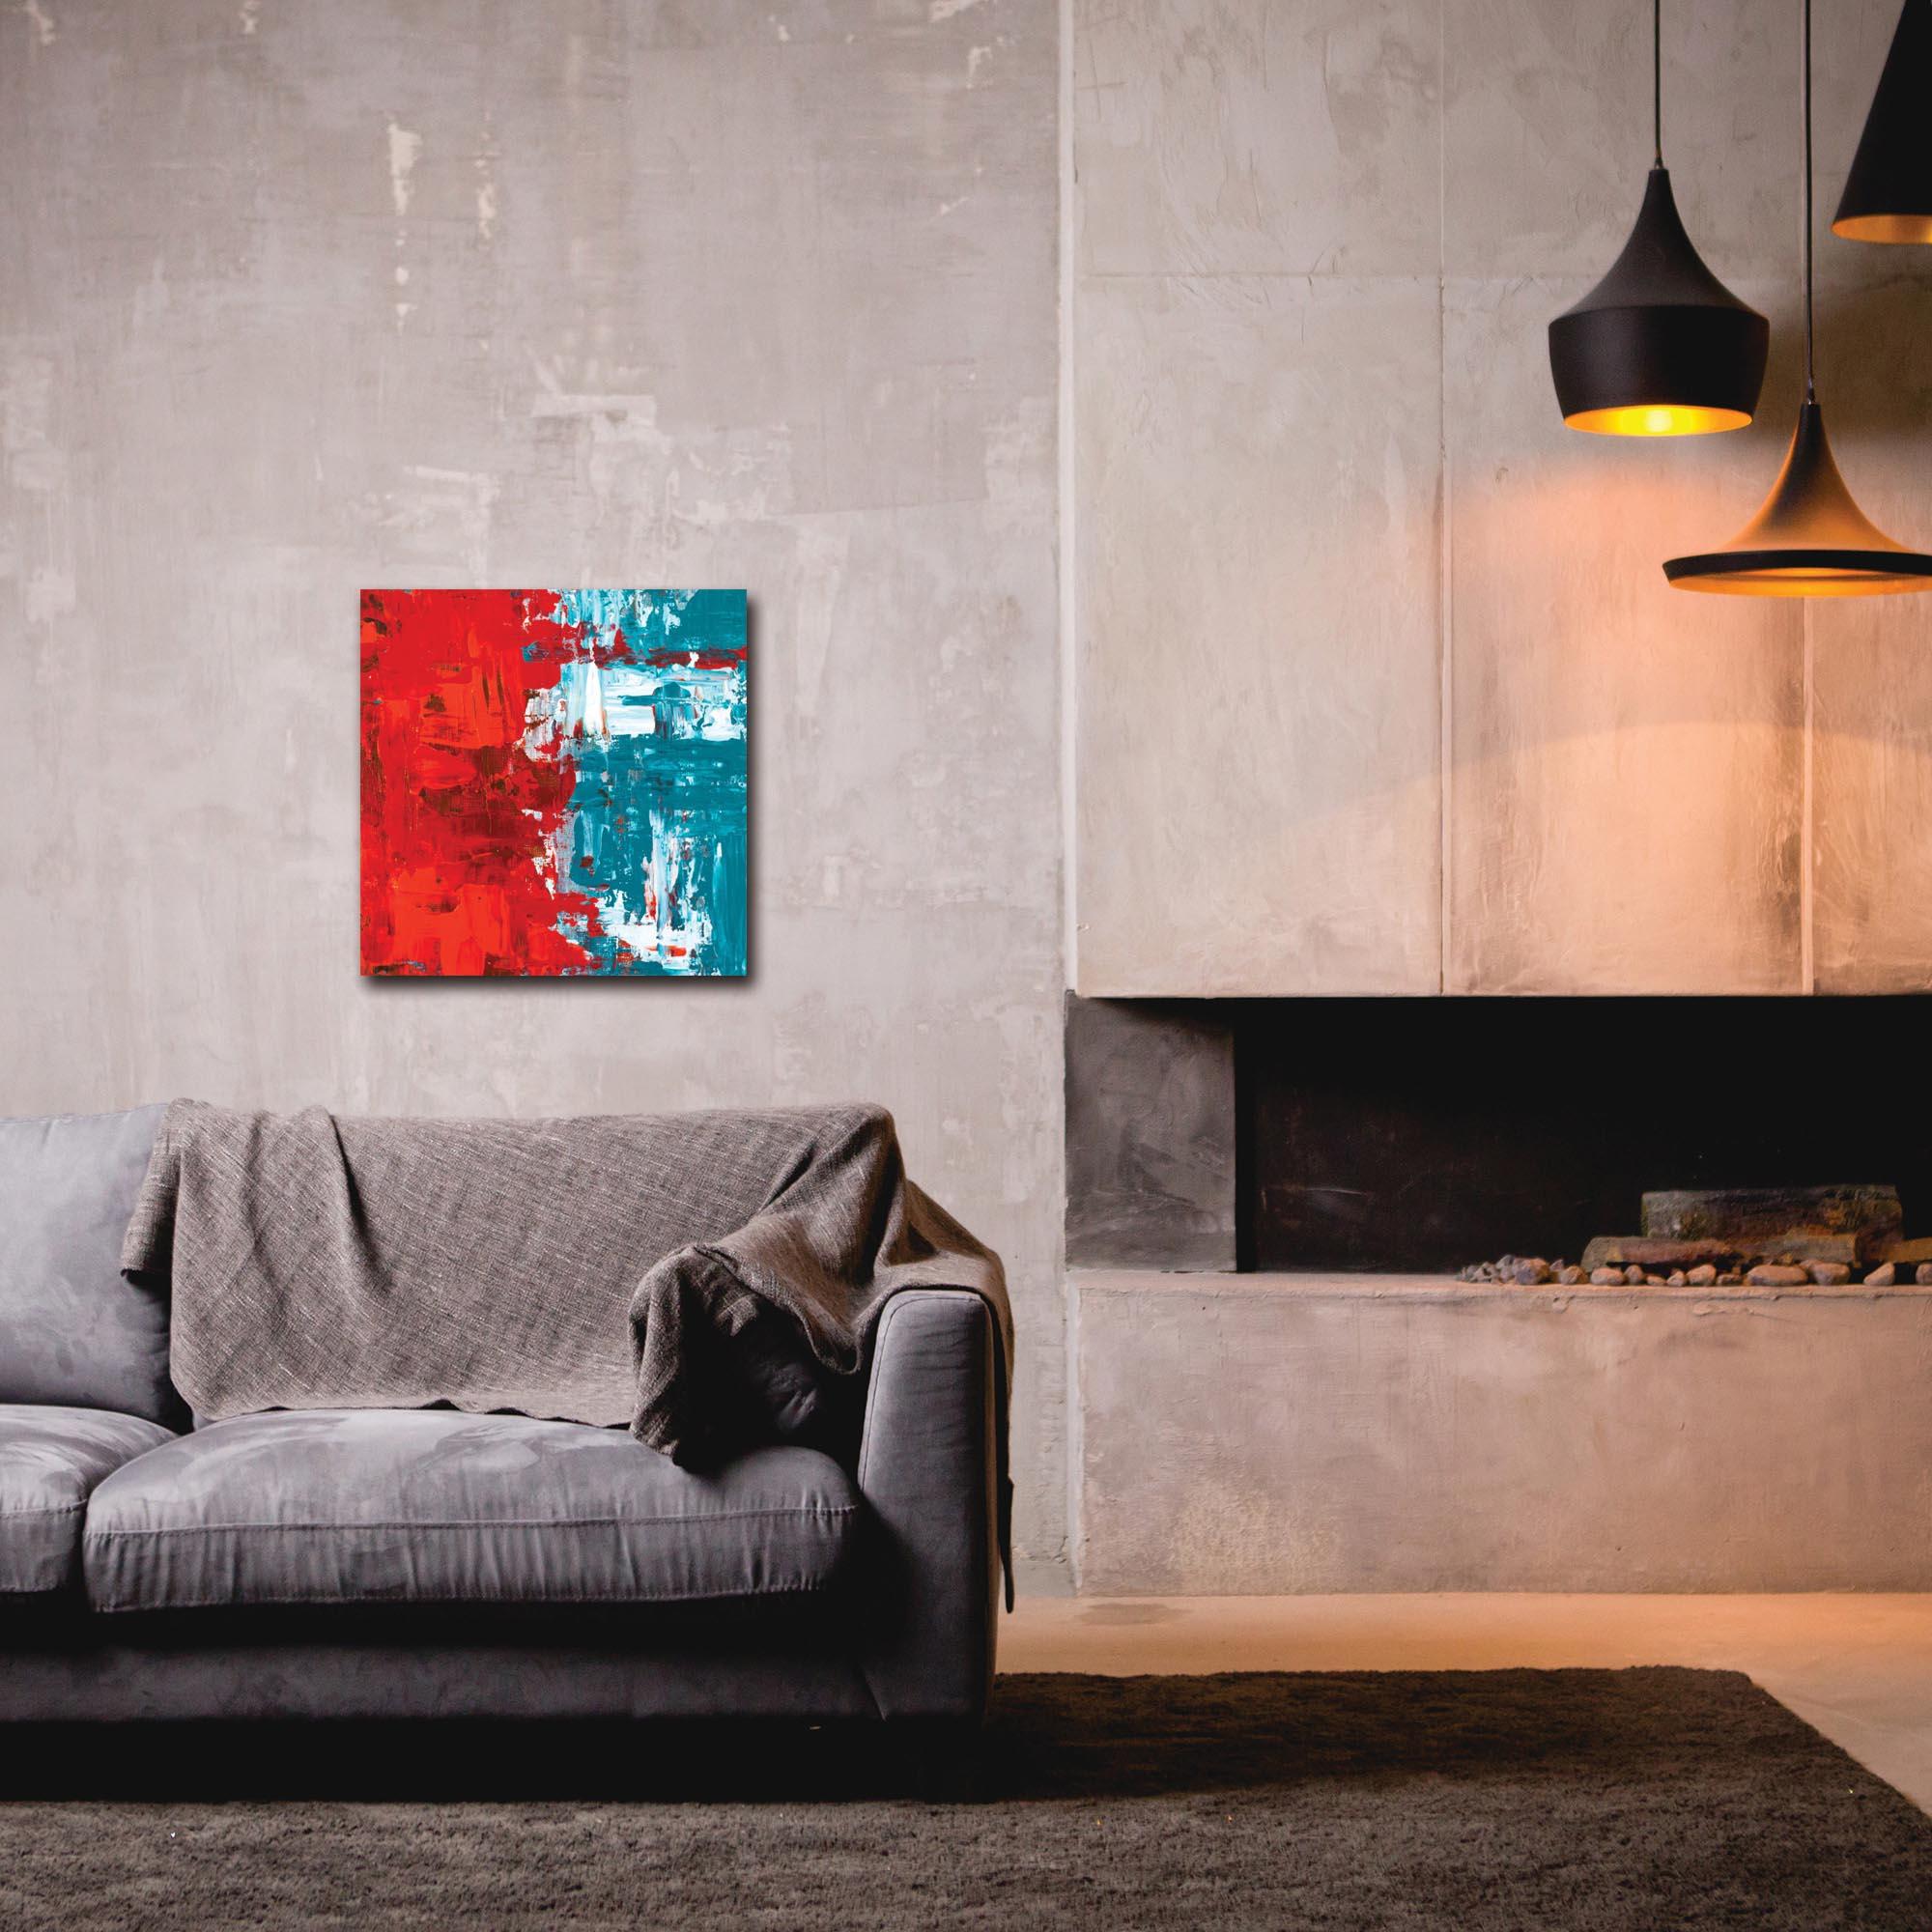 Abstract Wall Art 'Urban Life 13' - Urban Decor on Metal or Plexiglass - Lifestyle View